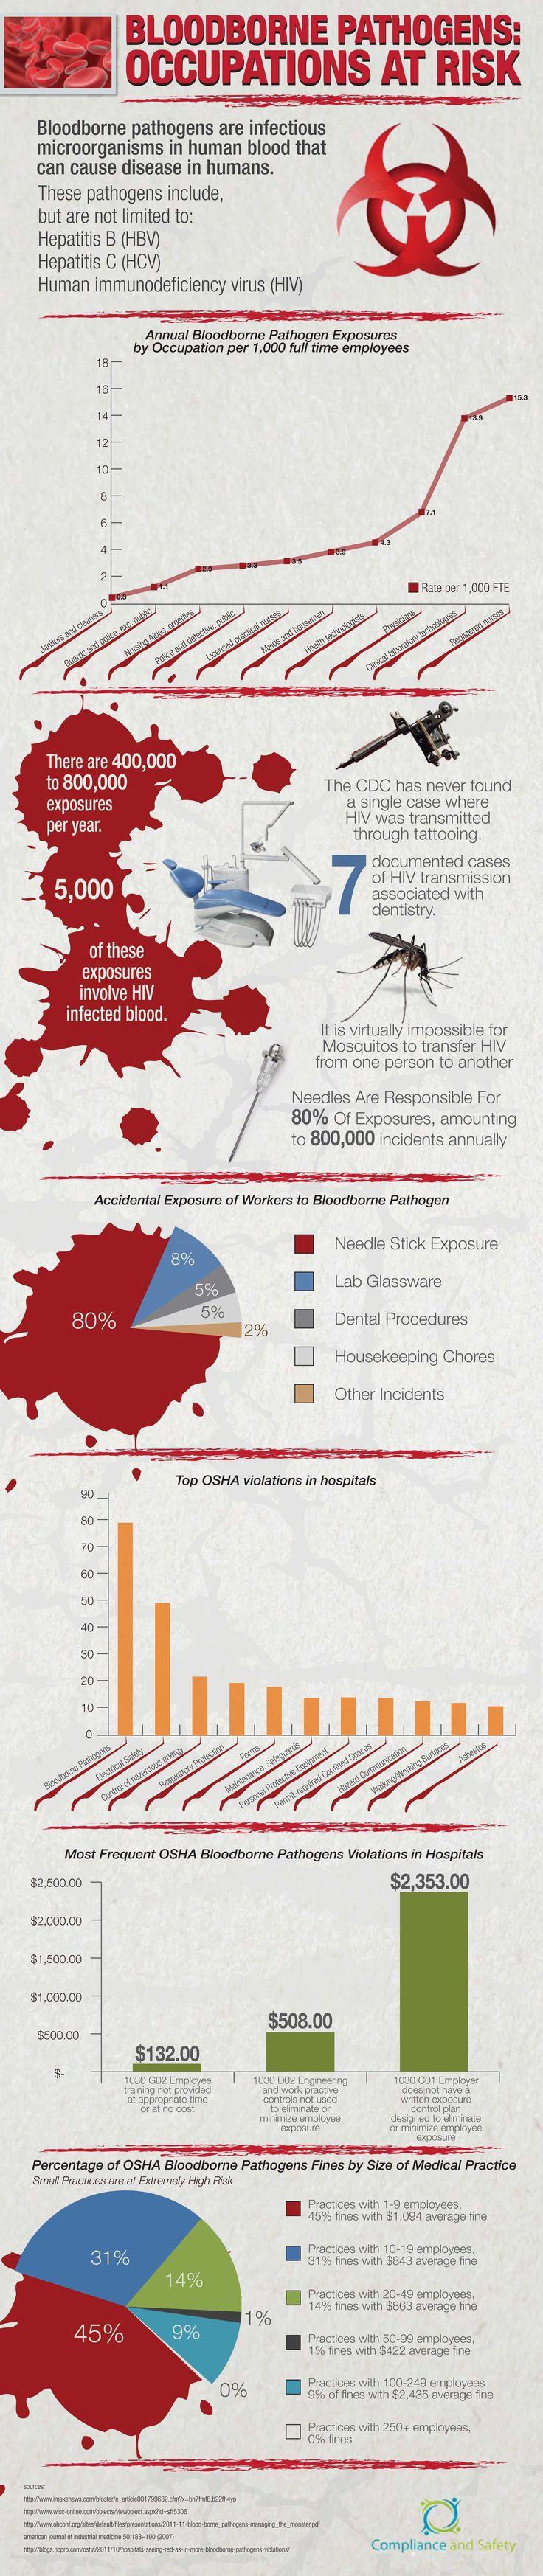 Bloodborne Pathogens: Occupations at Risk